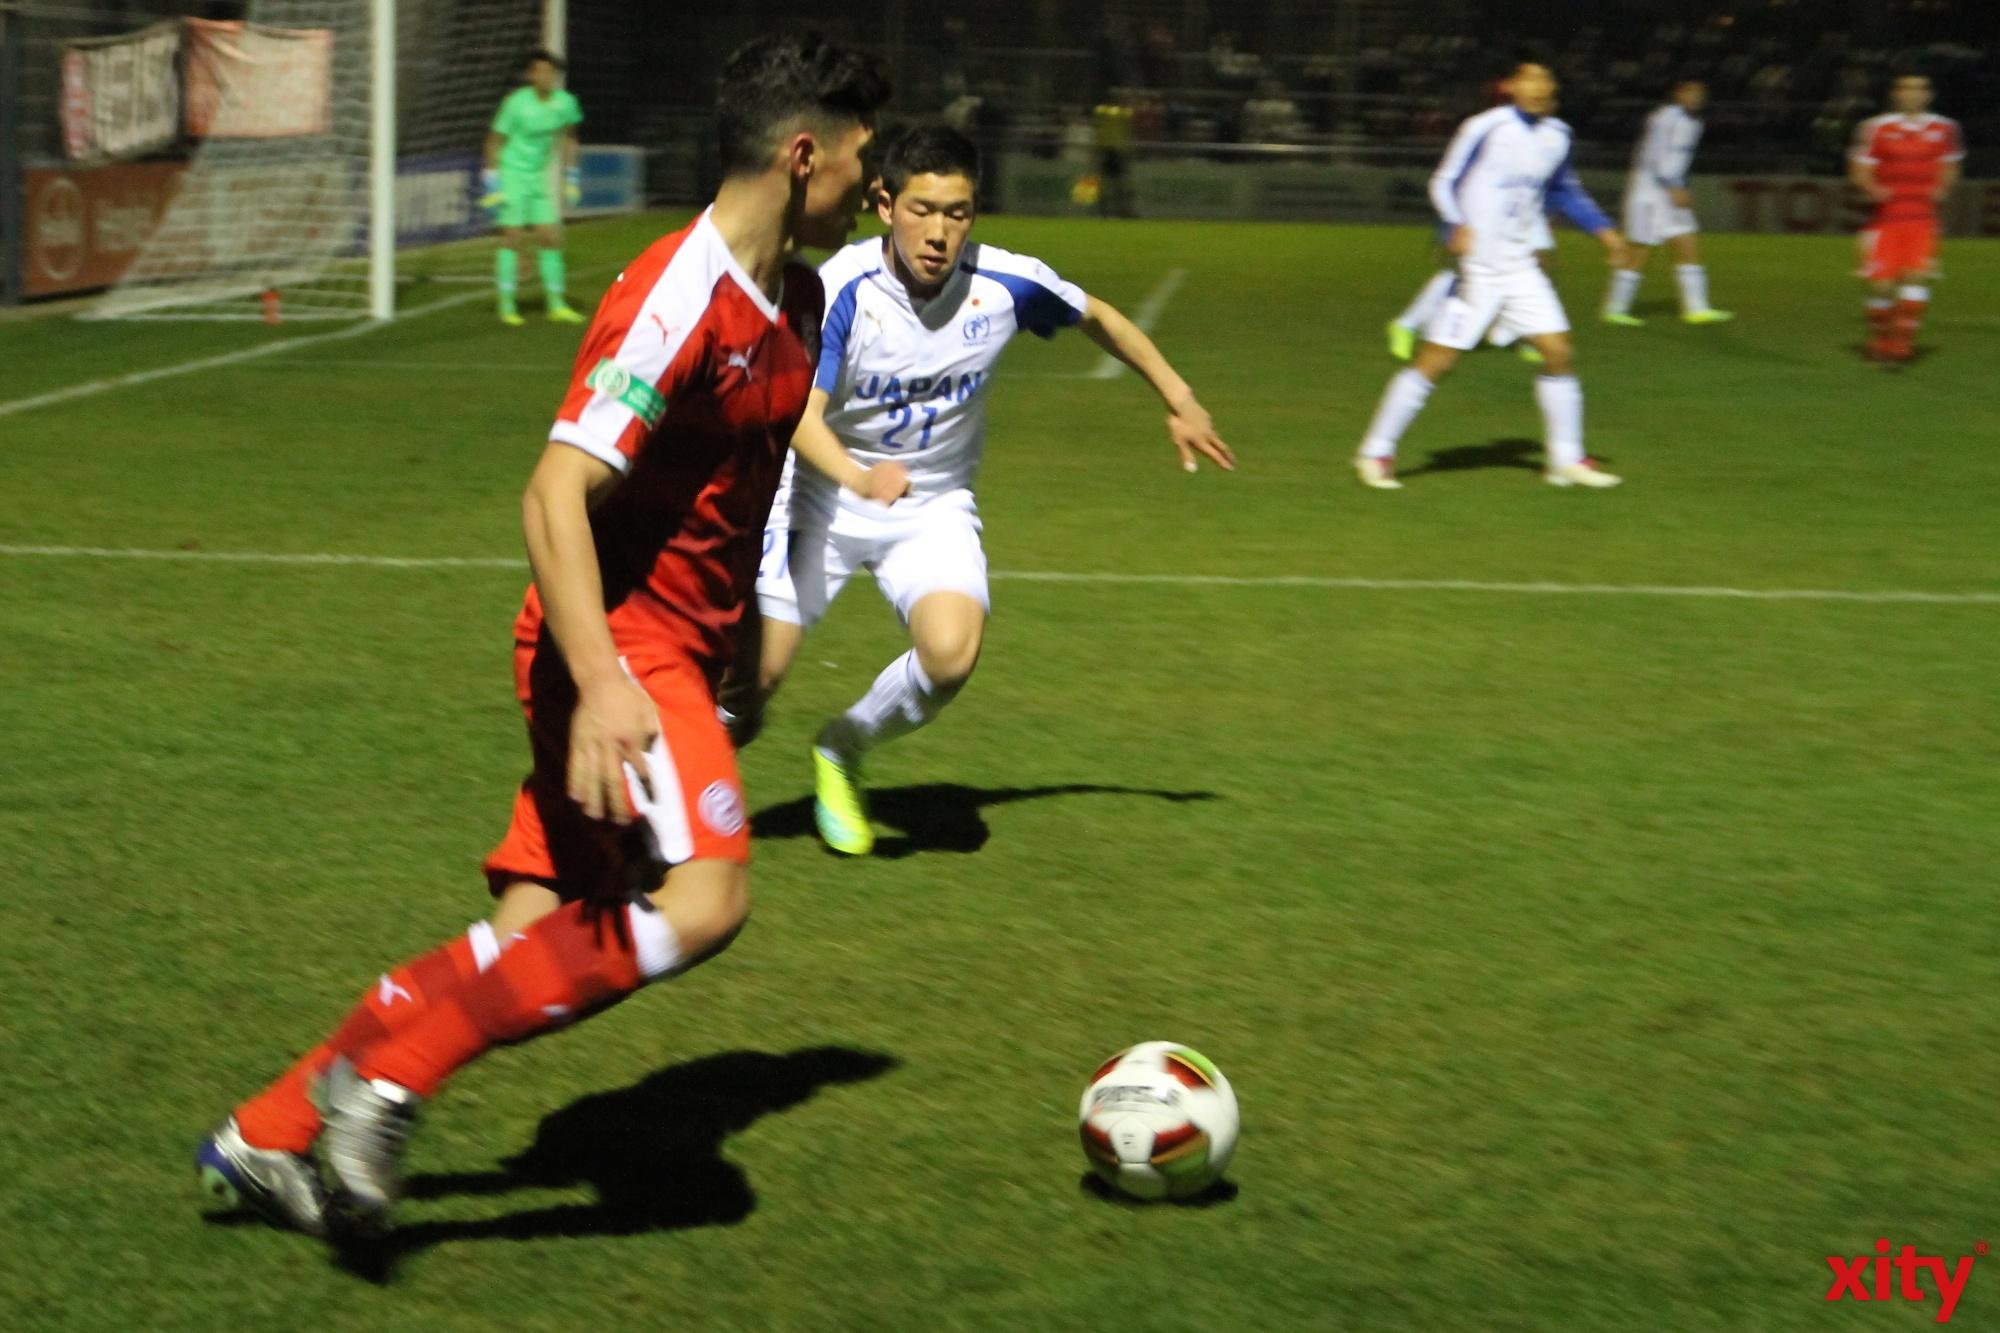 Beim U19-Cup kann man zukünftige Profis sehen (Foto: xity)